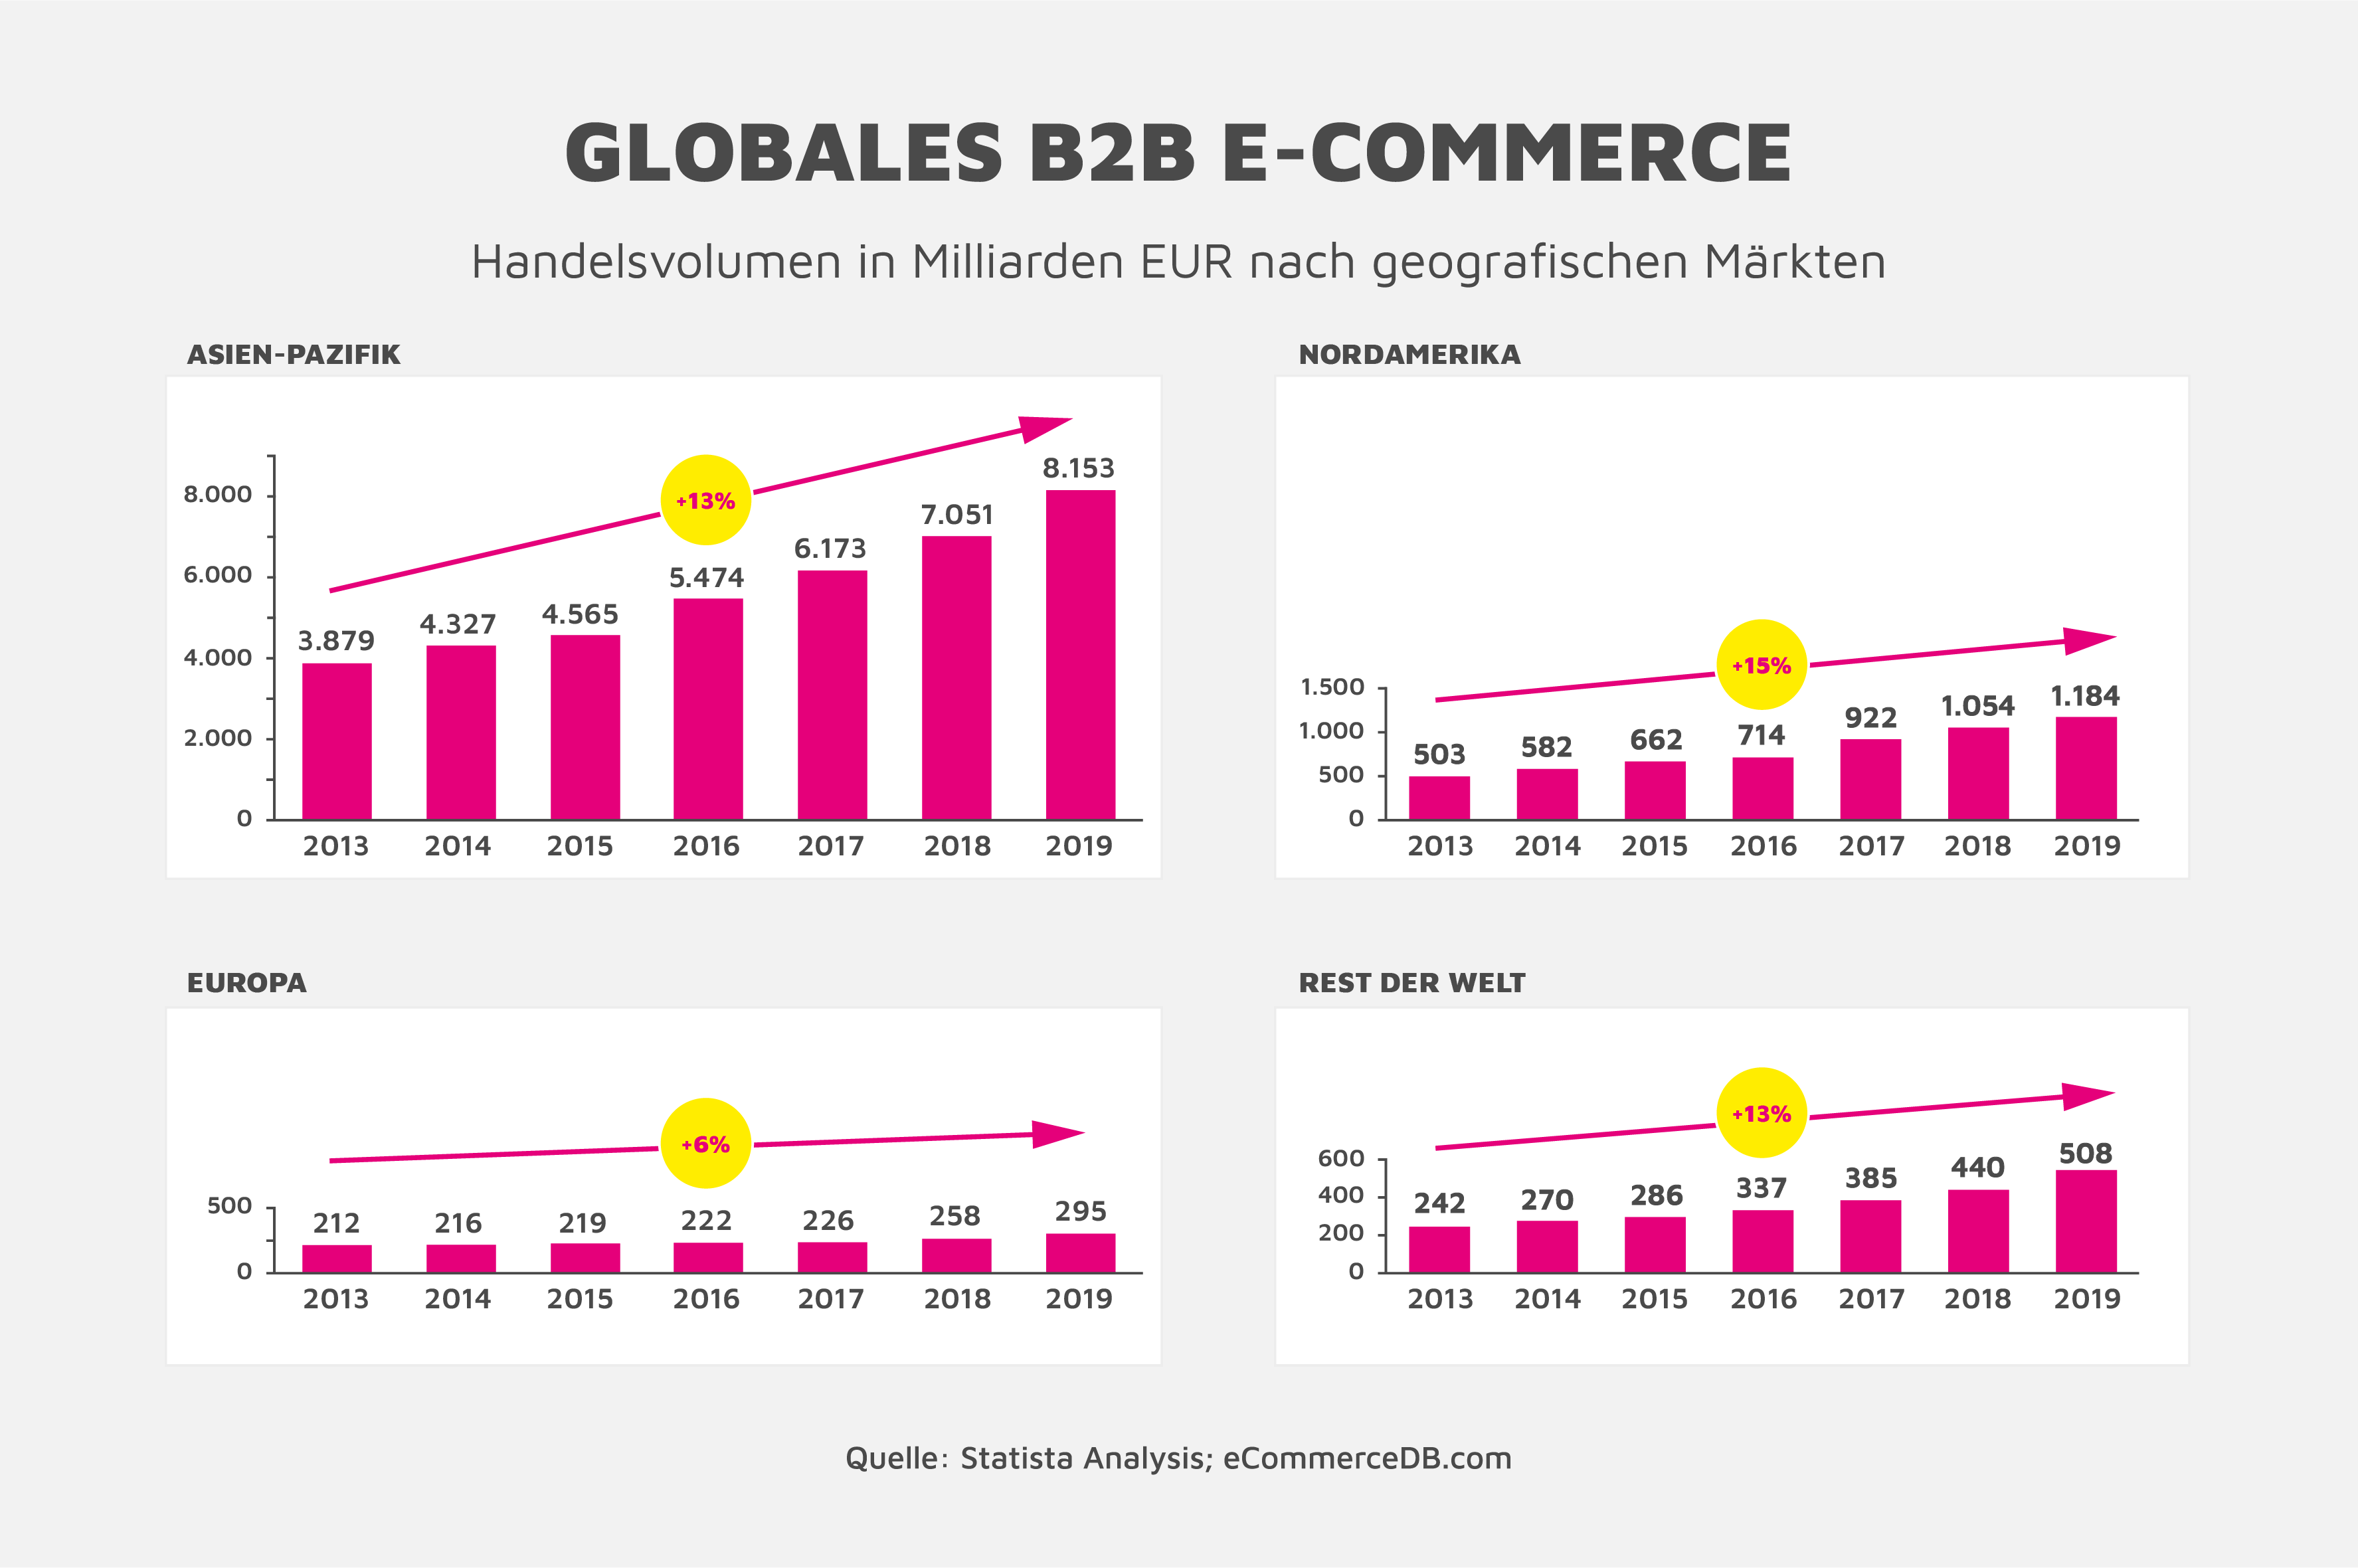 Darstellung Globales B2B ECommerce Handelsvolumen